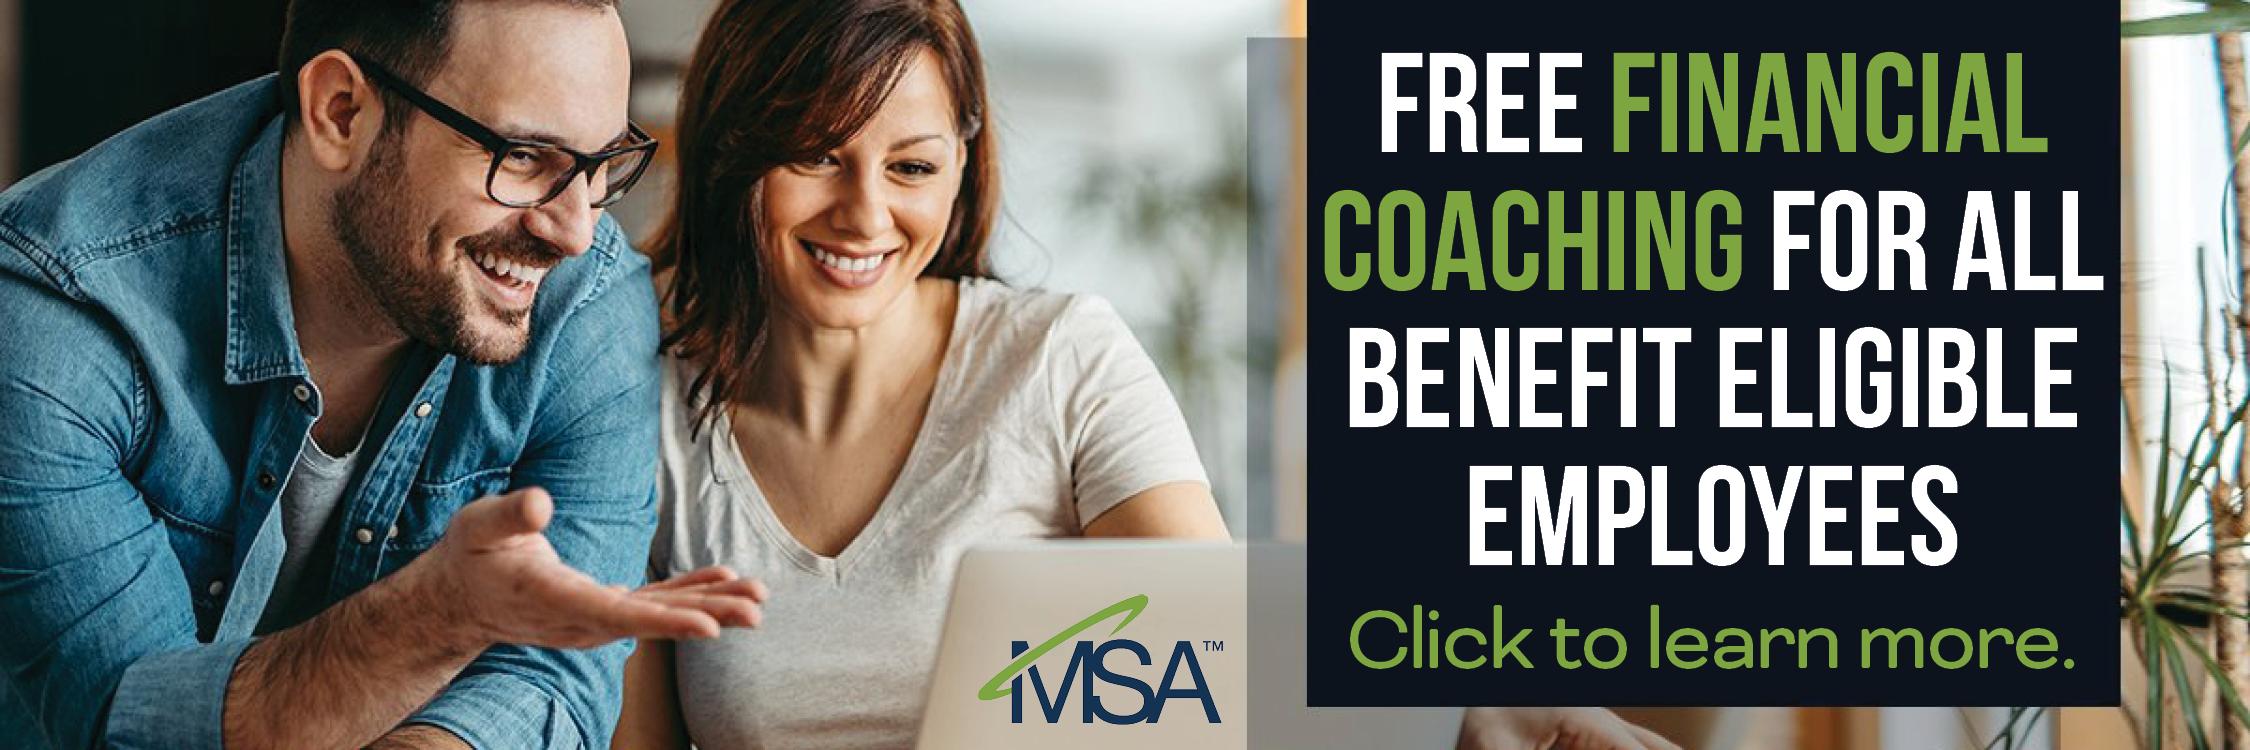 Imagen 3: Coaching financiero de MSA